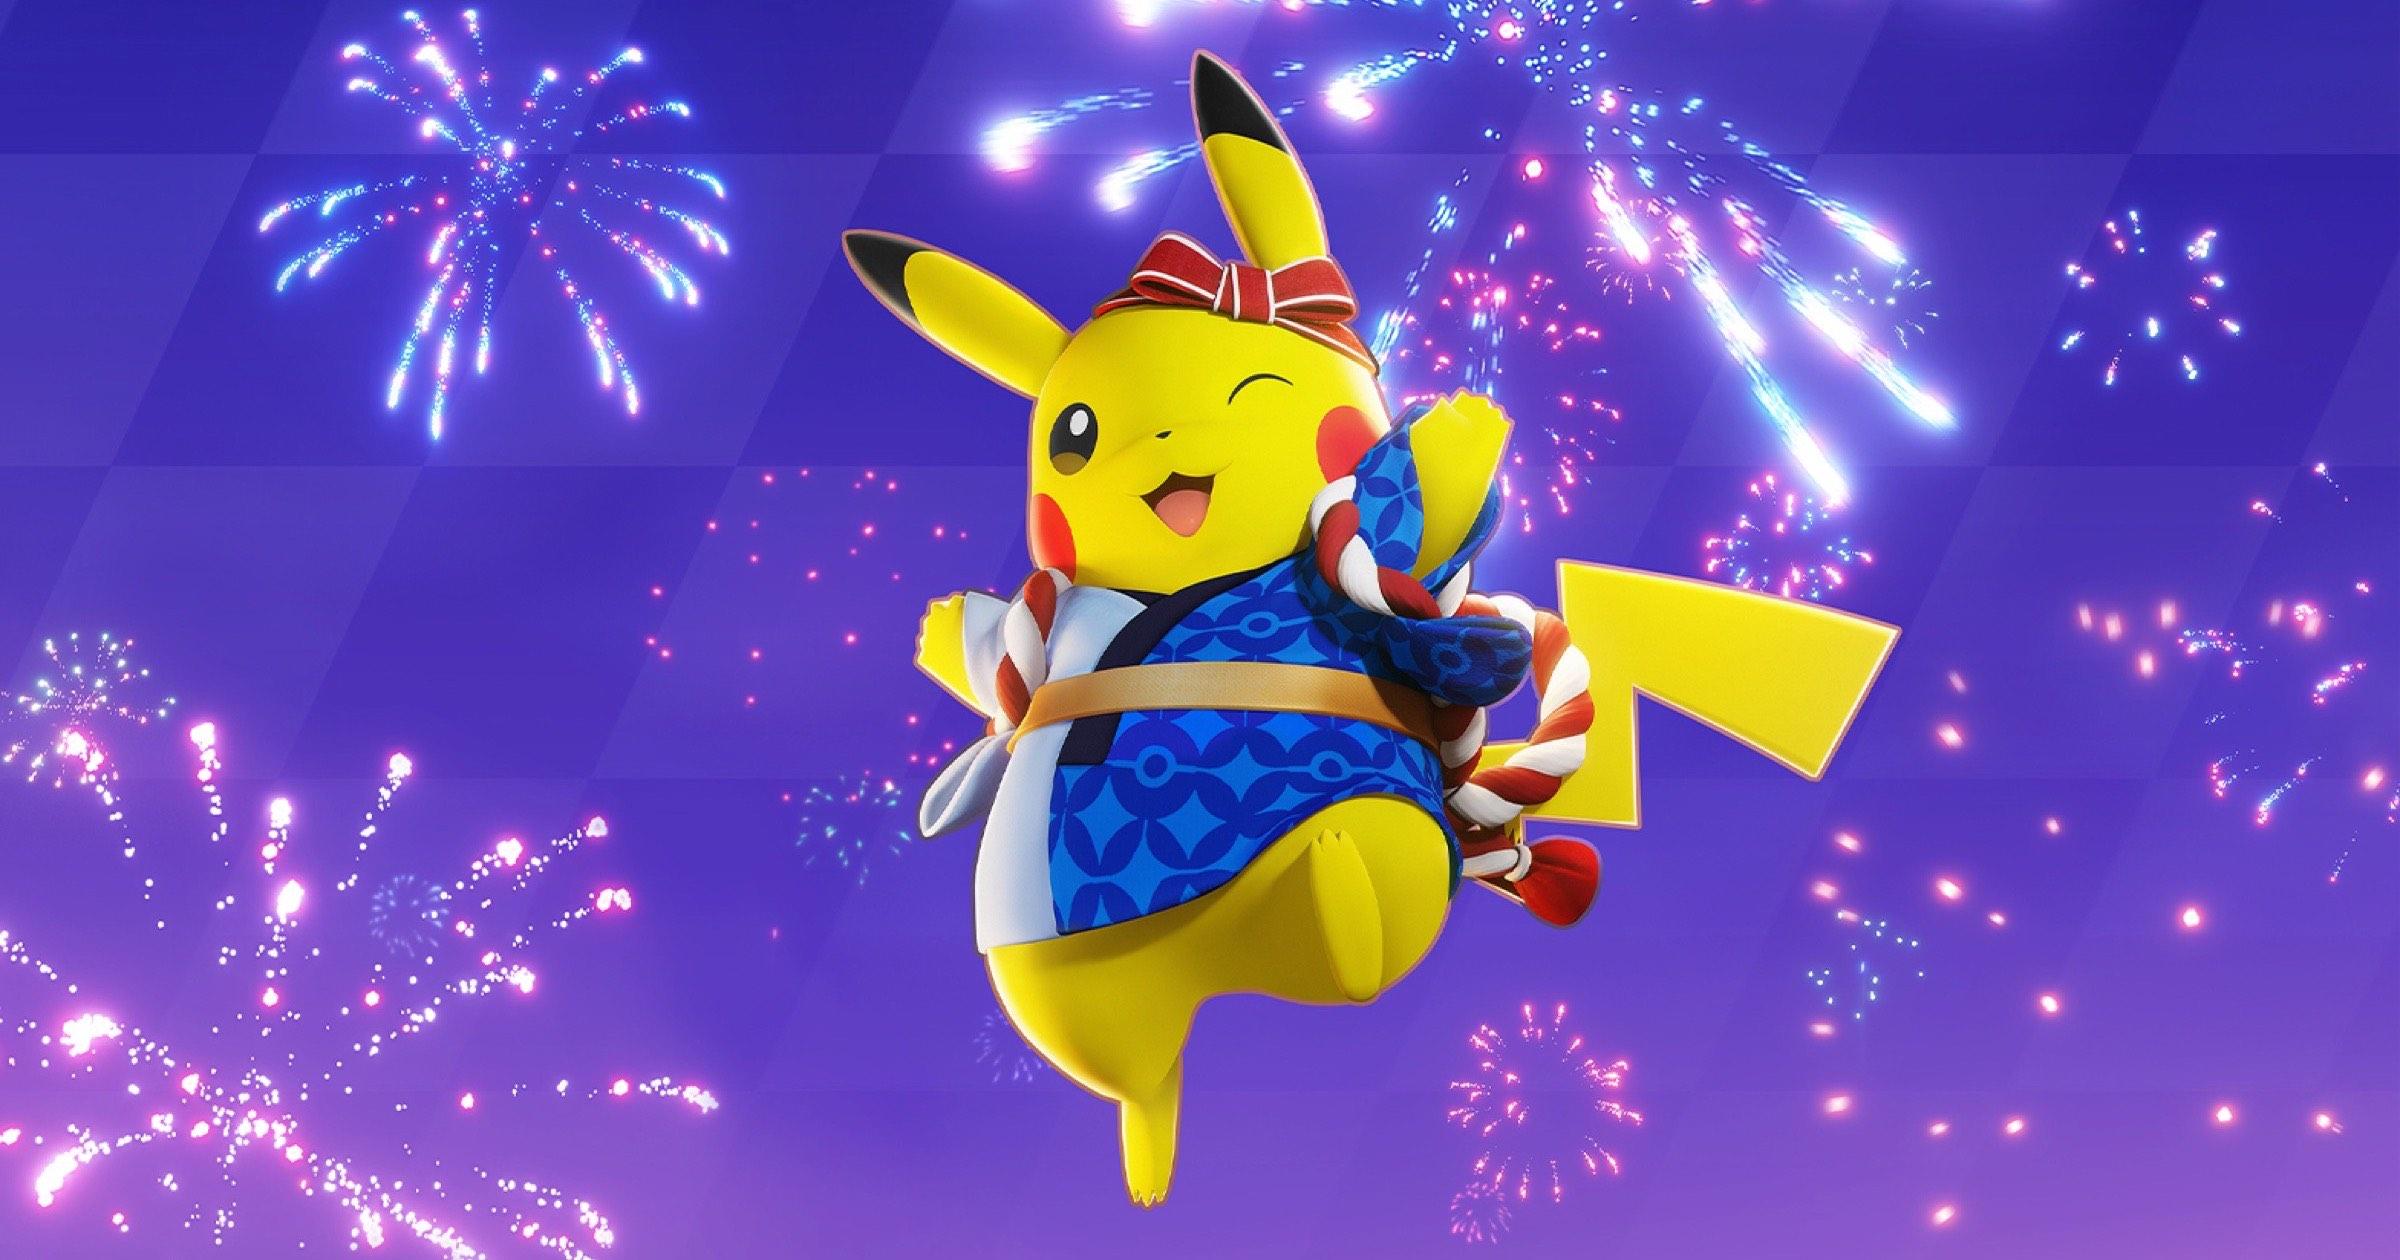 Pikachu from Pokémon unite